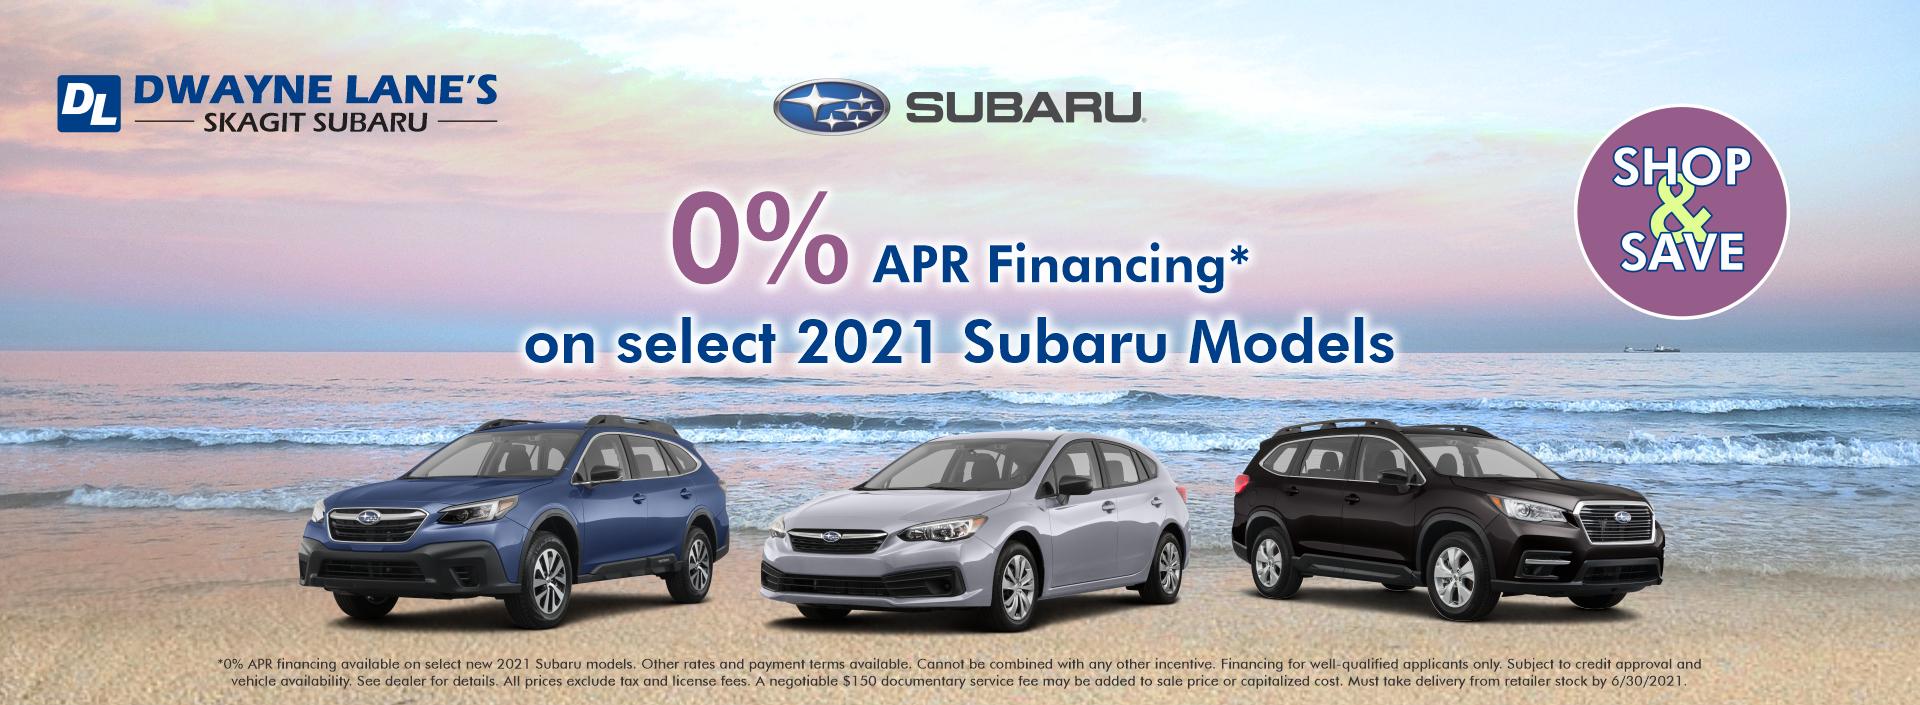 2021JuneBanners-DLAF-Subaru